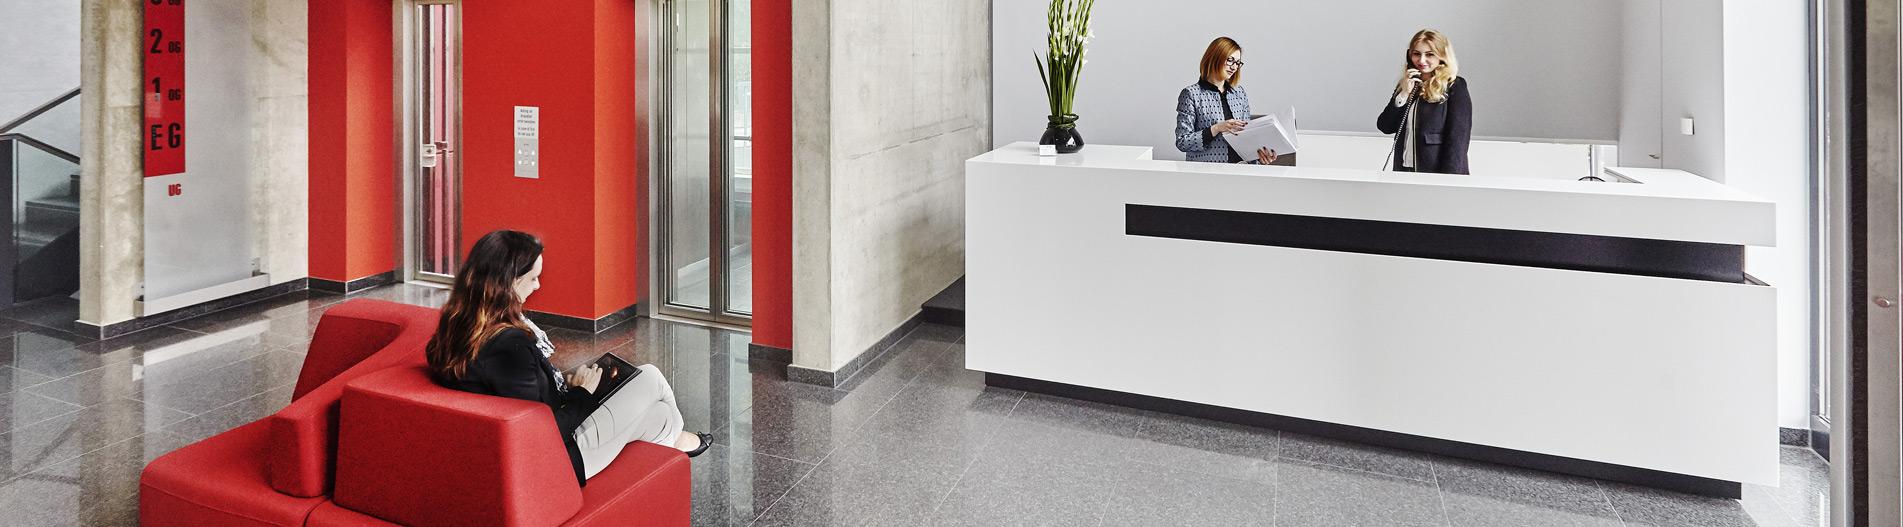 Office space rentals in Frankfurt